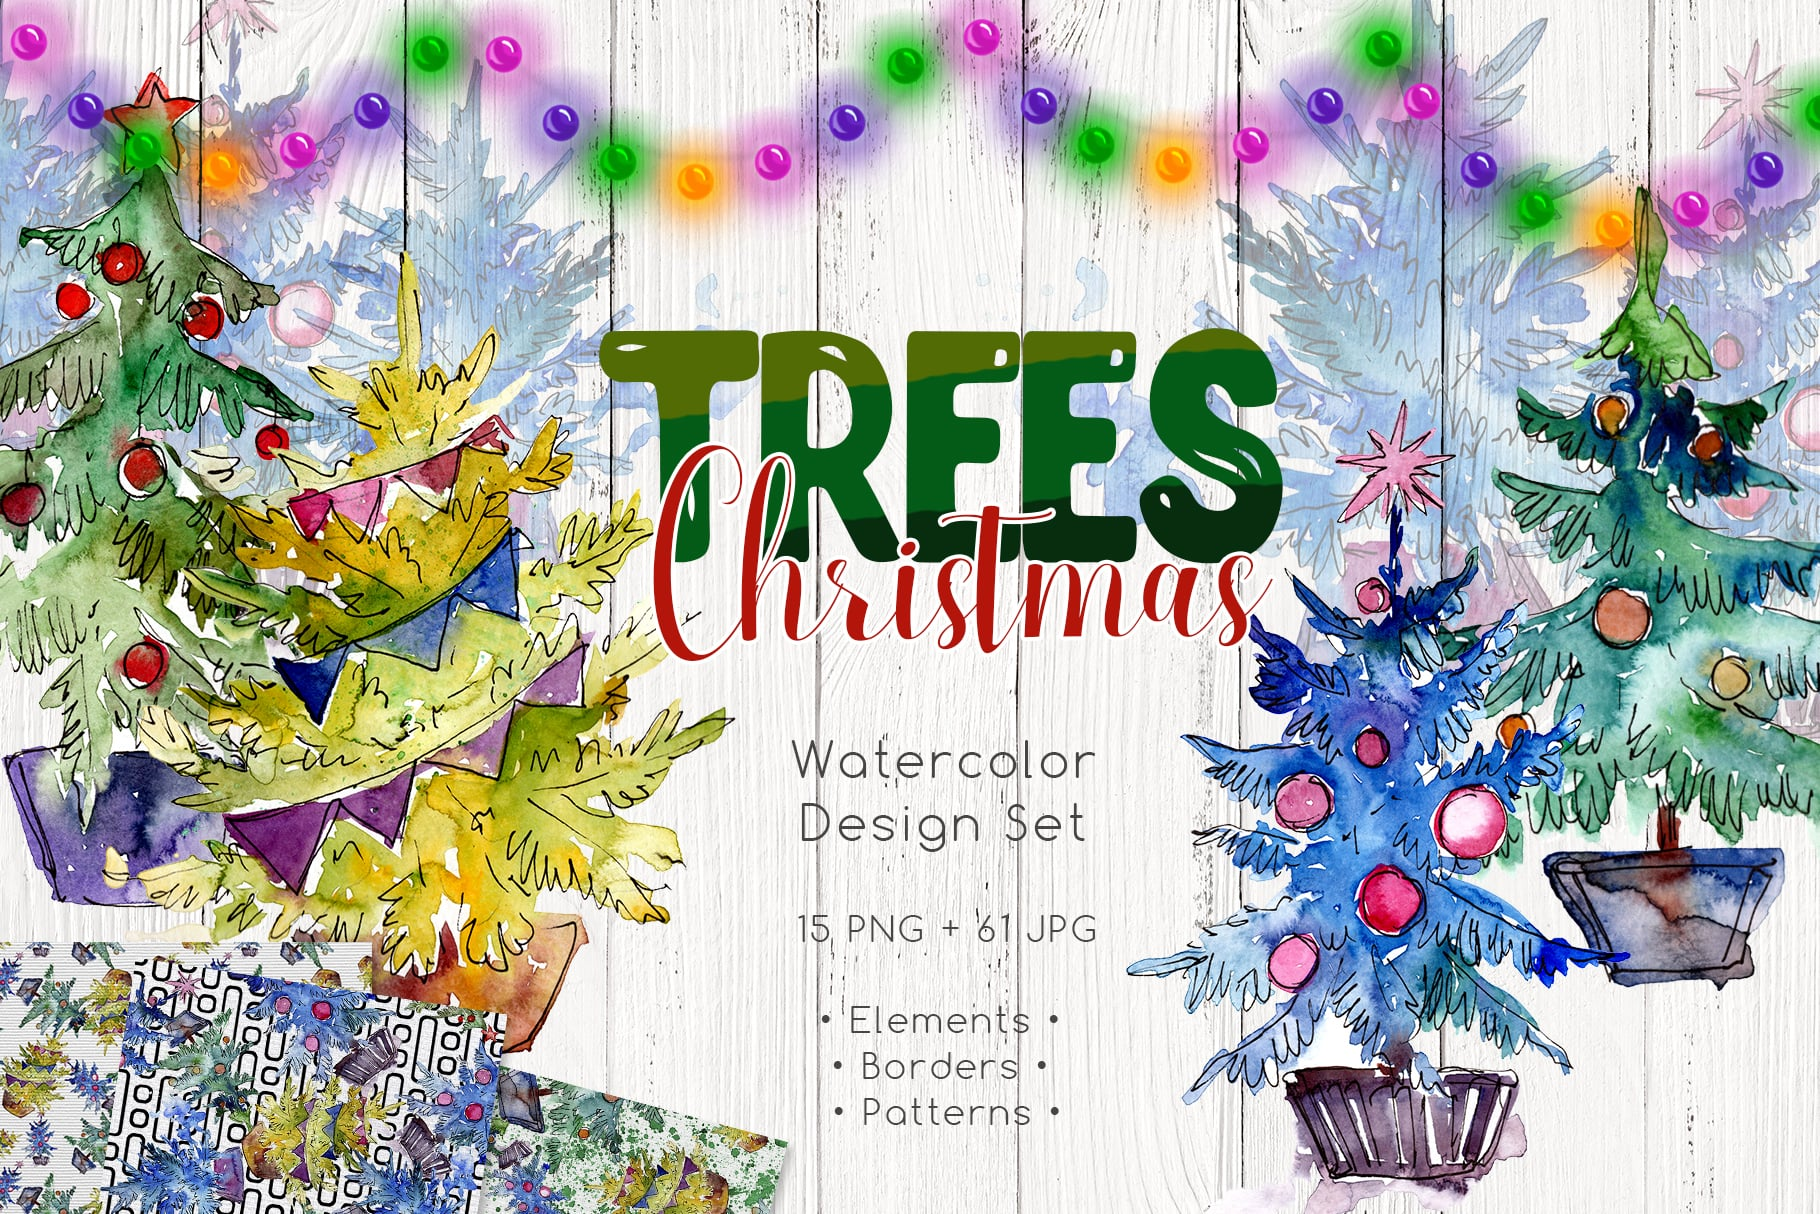 Trees Christmas PNG watercolor set - $11 - MYSTOCKS 4377